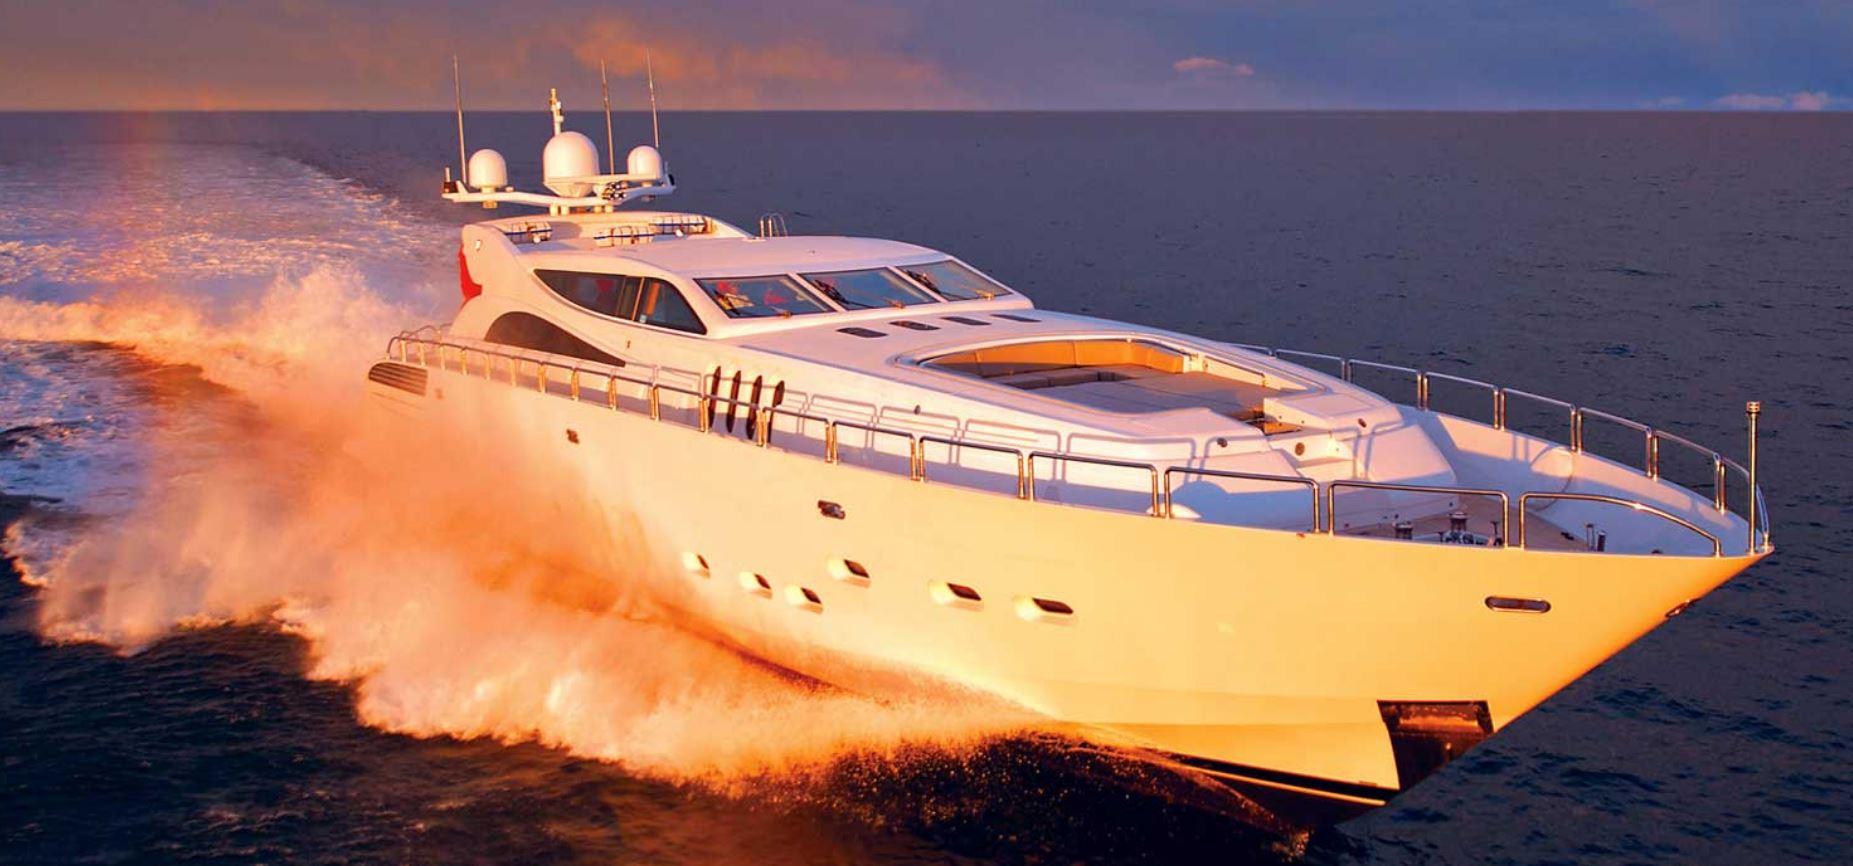 yacht.JPG